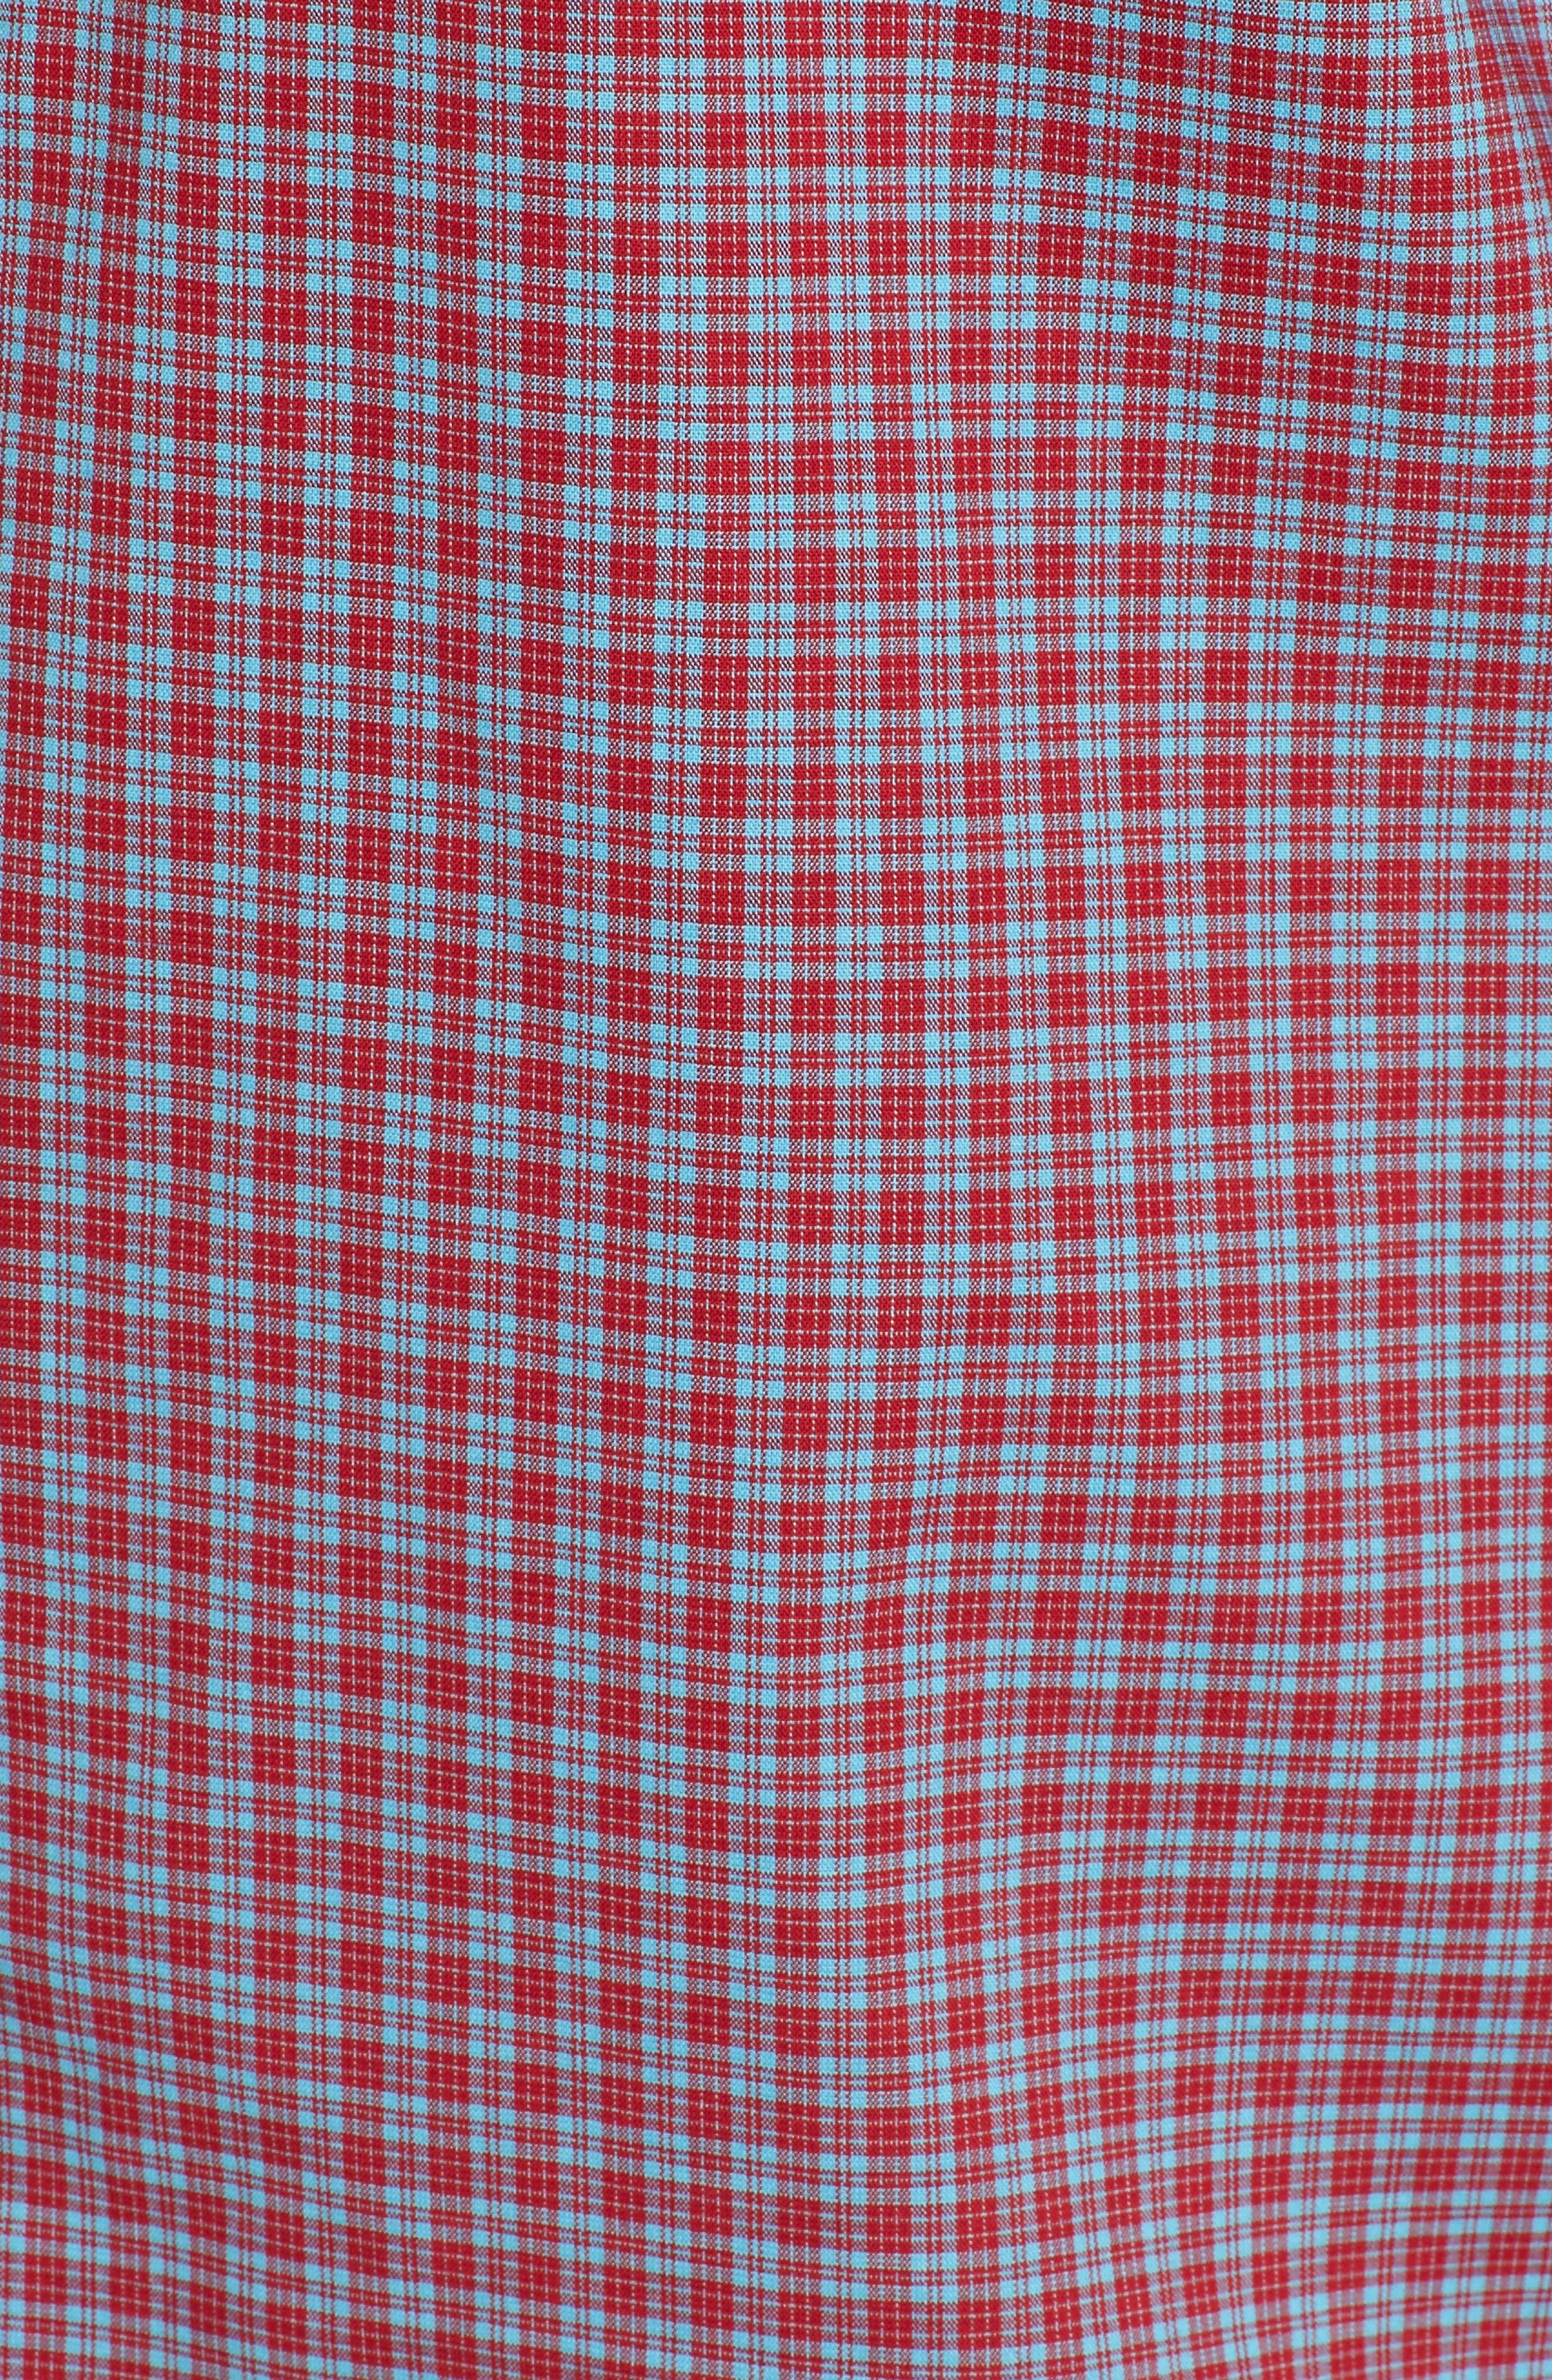 Tech-Smart Trim Fit Check Sport Shirt,                             Alternate thumbnail 5, color,                             Red Pompeii Blue Micro Check